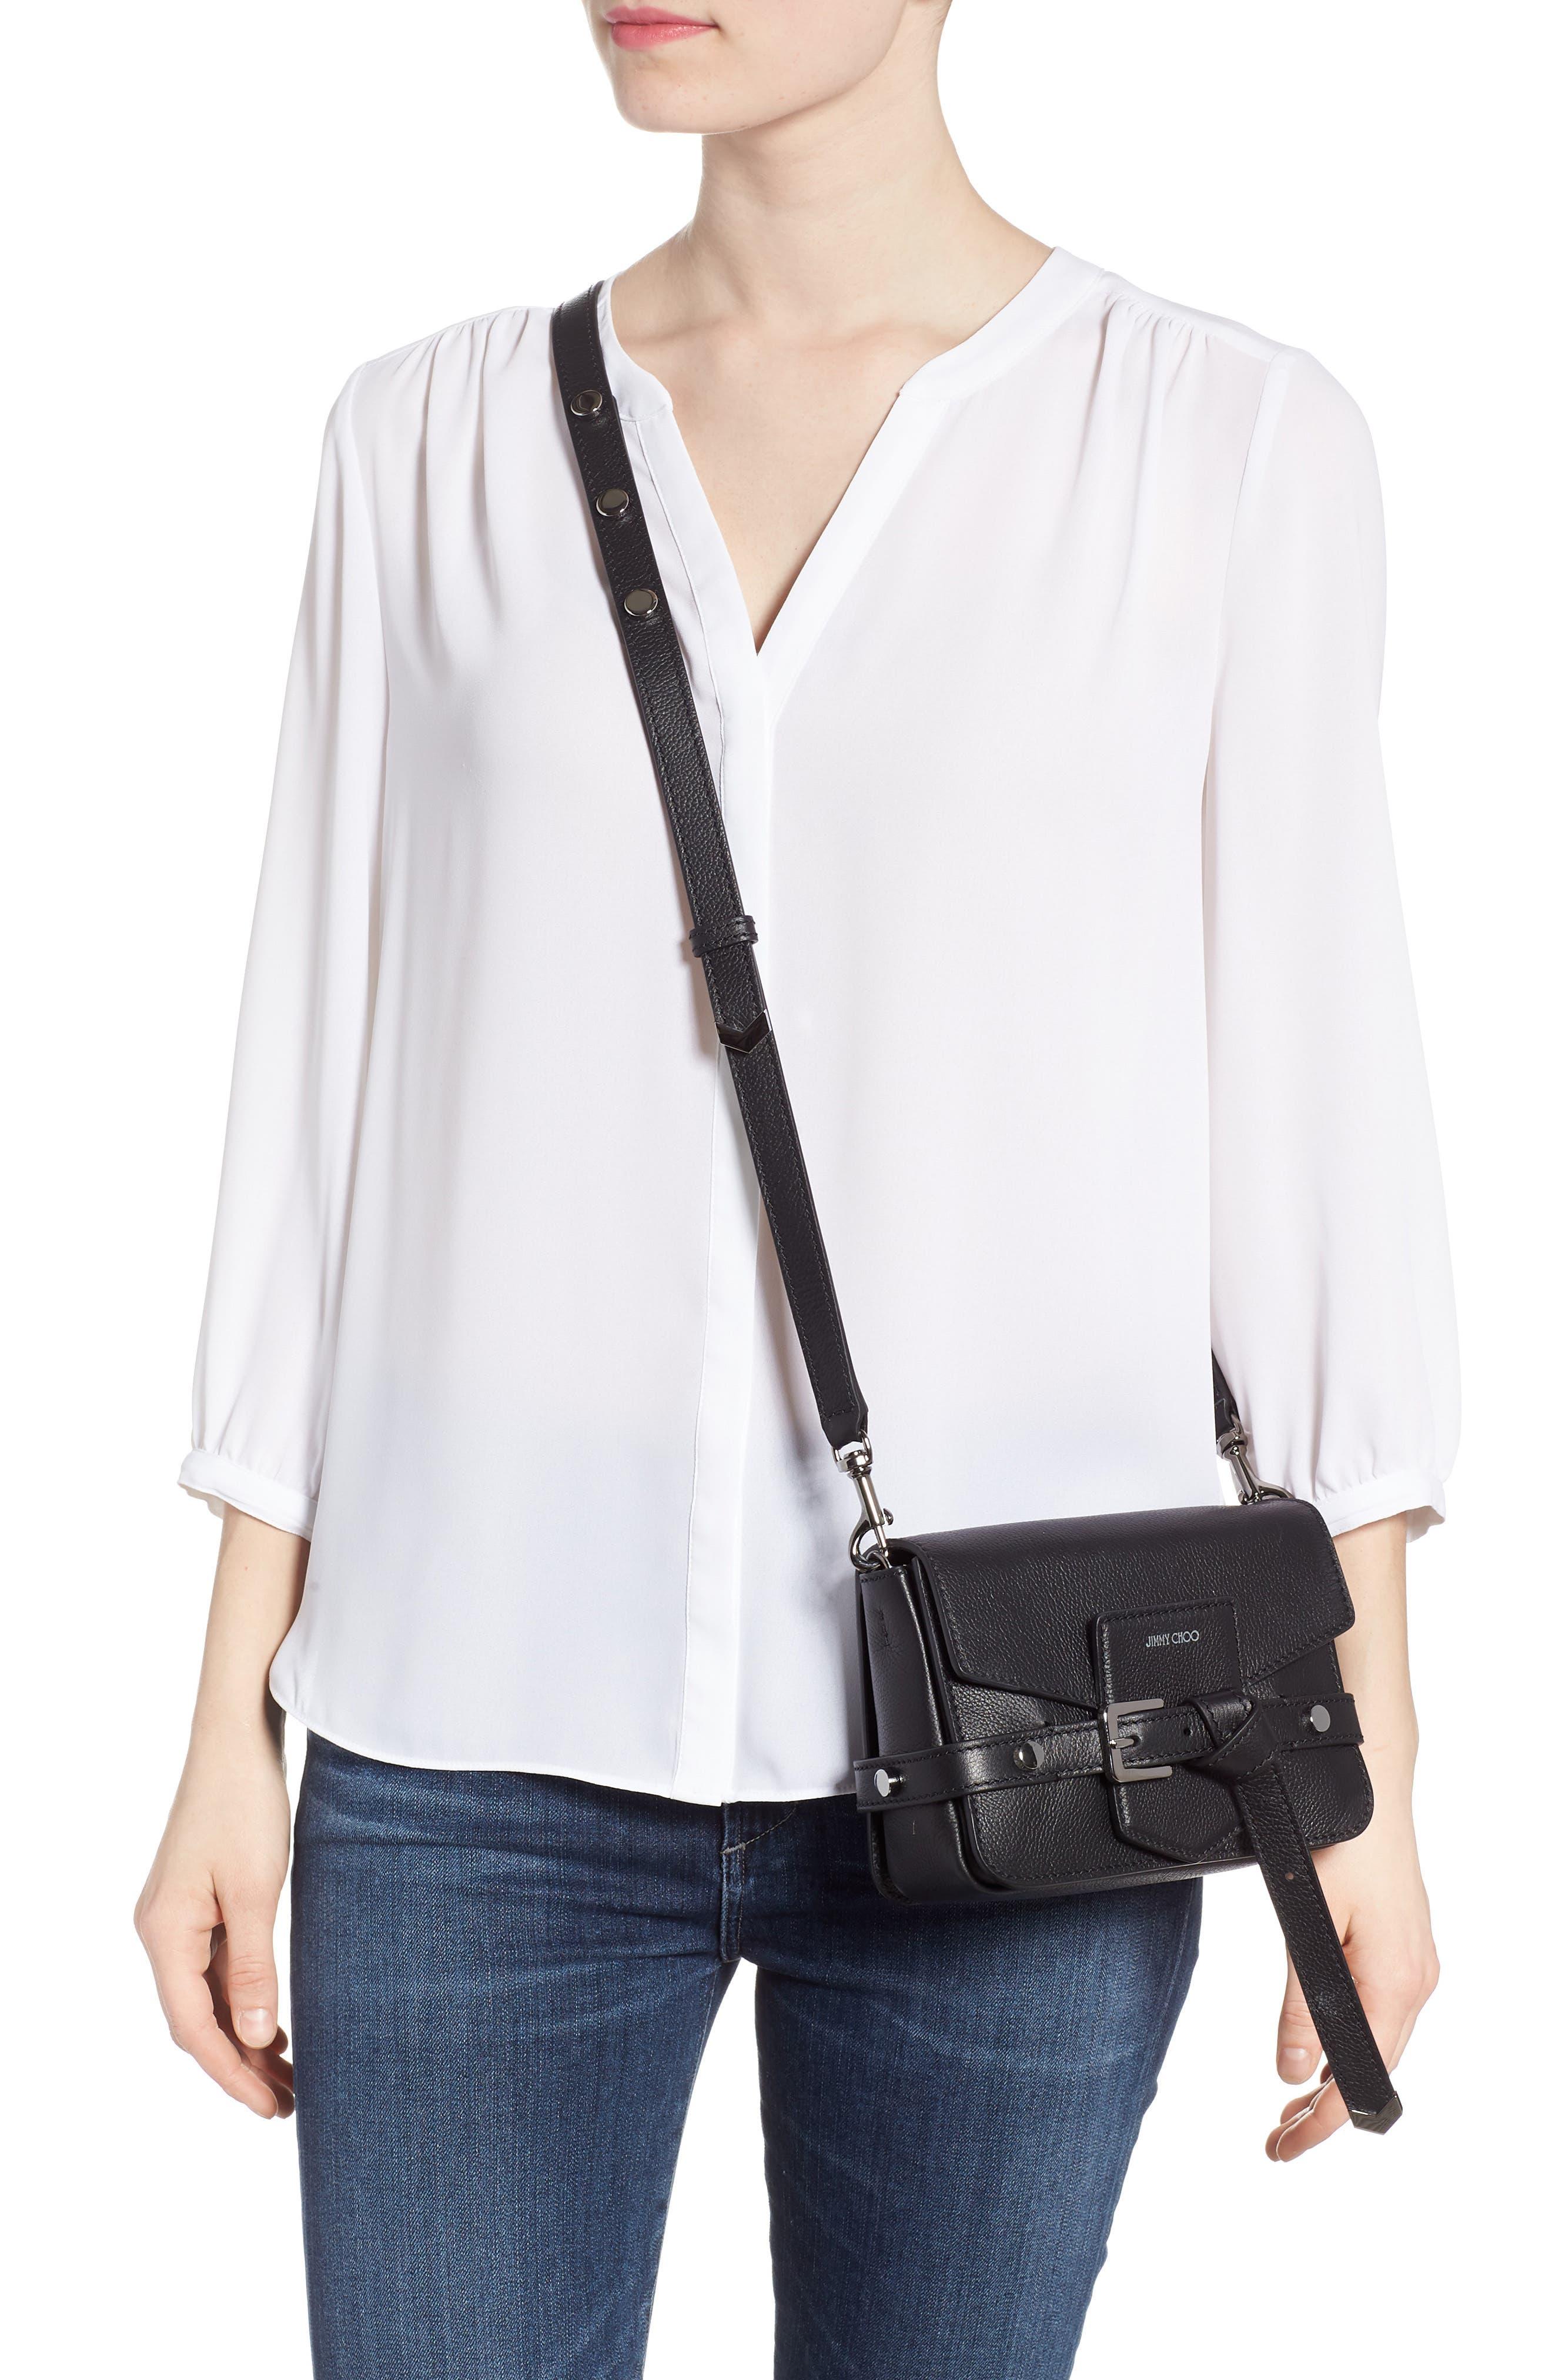 Lexi Grained Leather Crossbody Bag,                             Alternate thumbnail 2, color,                             BLACK